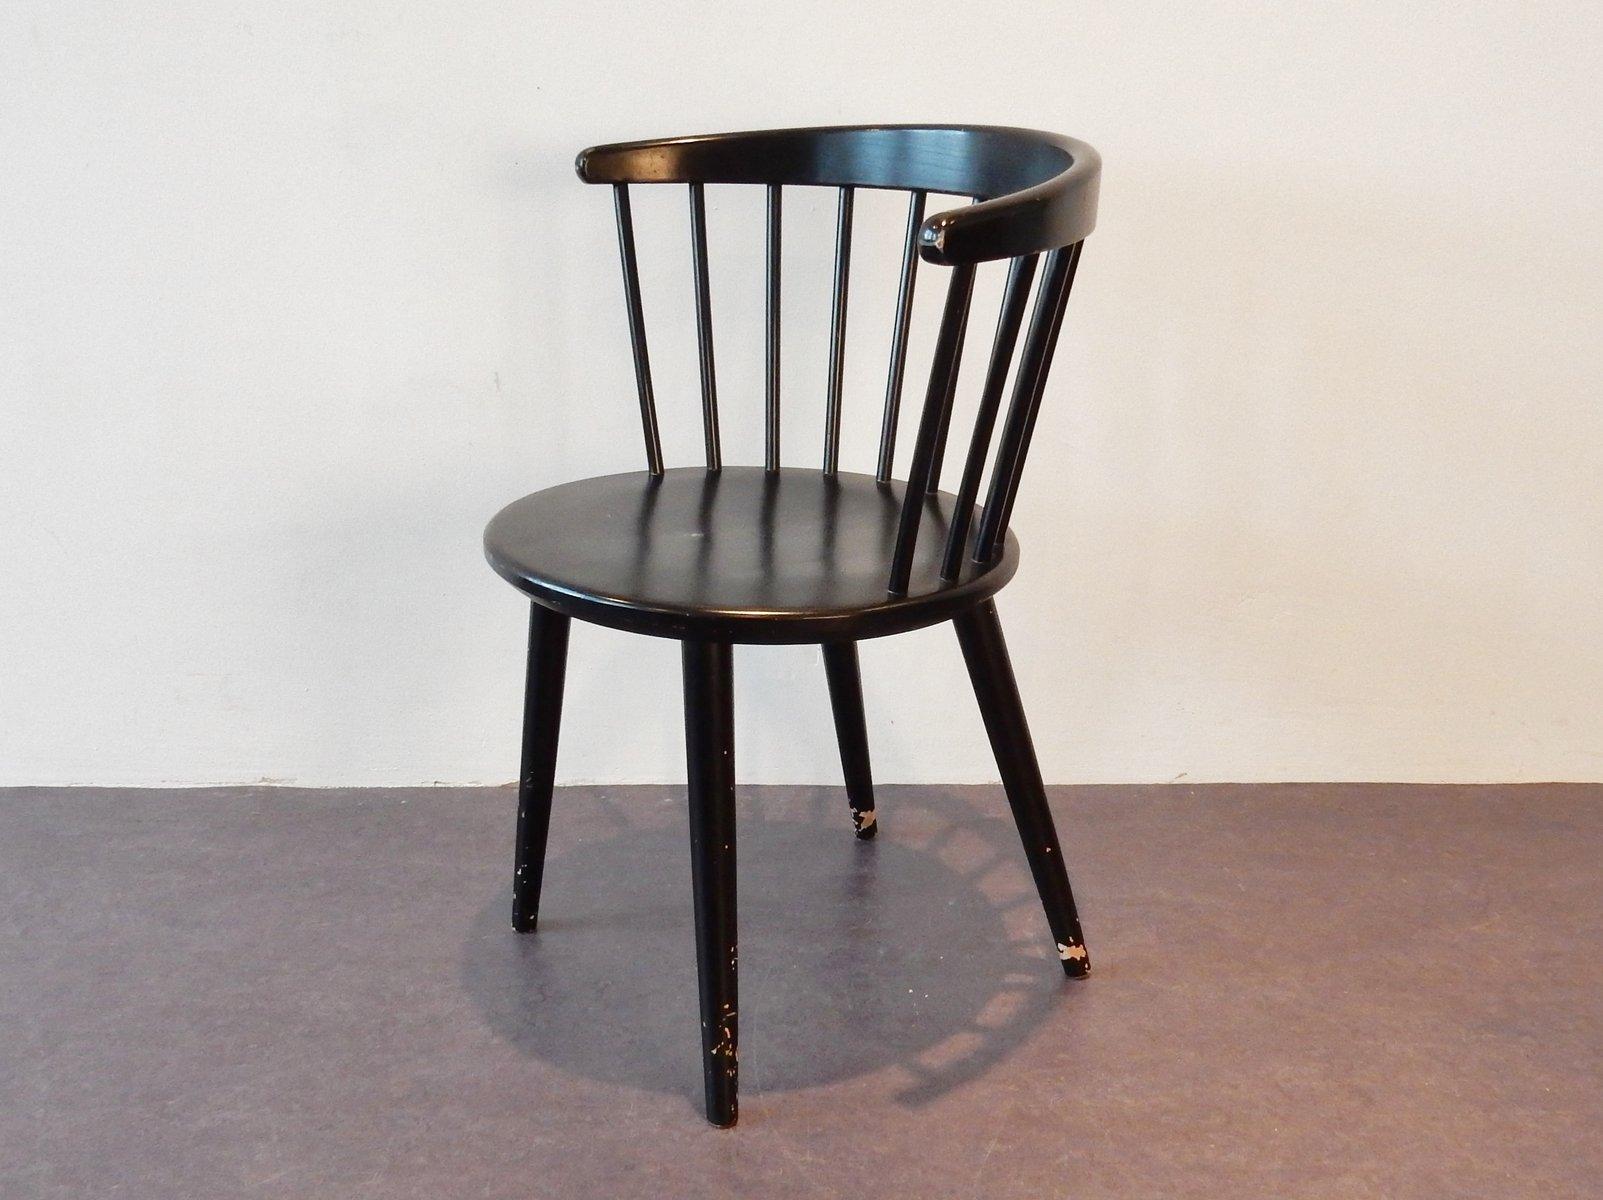 d nischer vintage stuhl von yngve ekstrom f r nesto. Black Bedroom Furniture Sets. Home Design Ideas